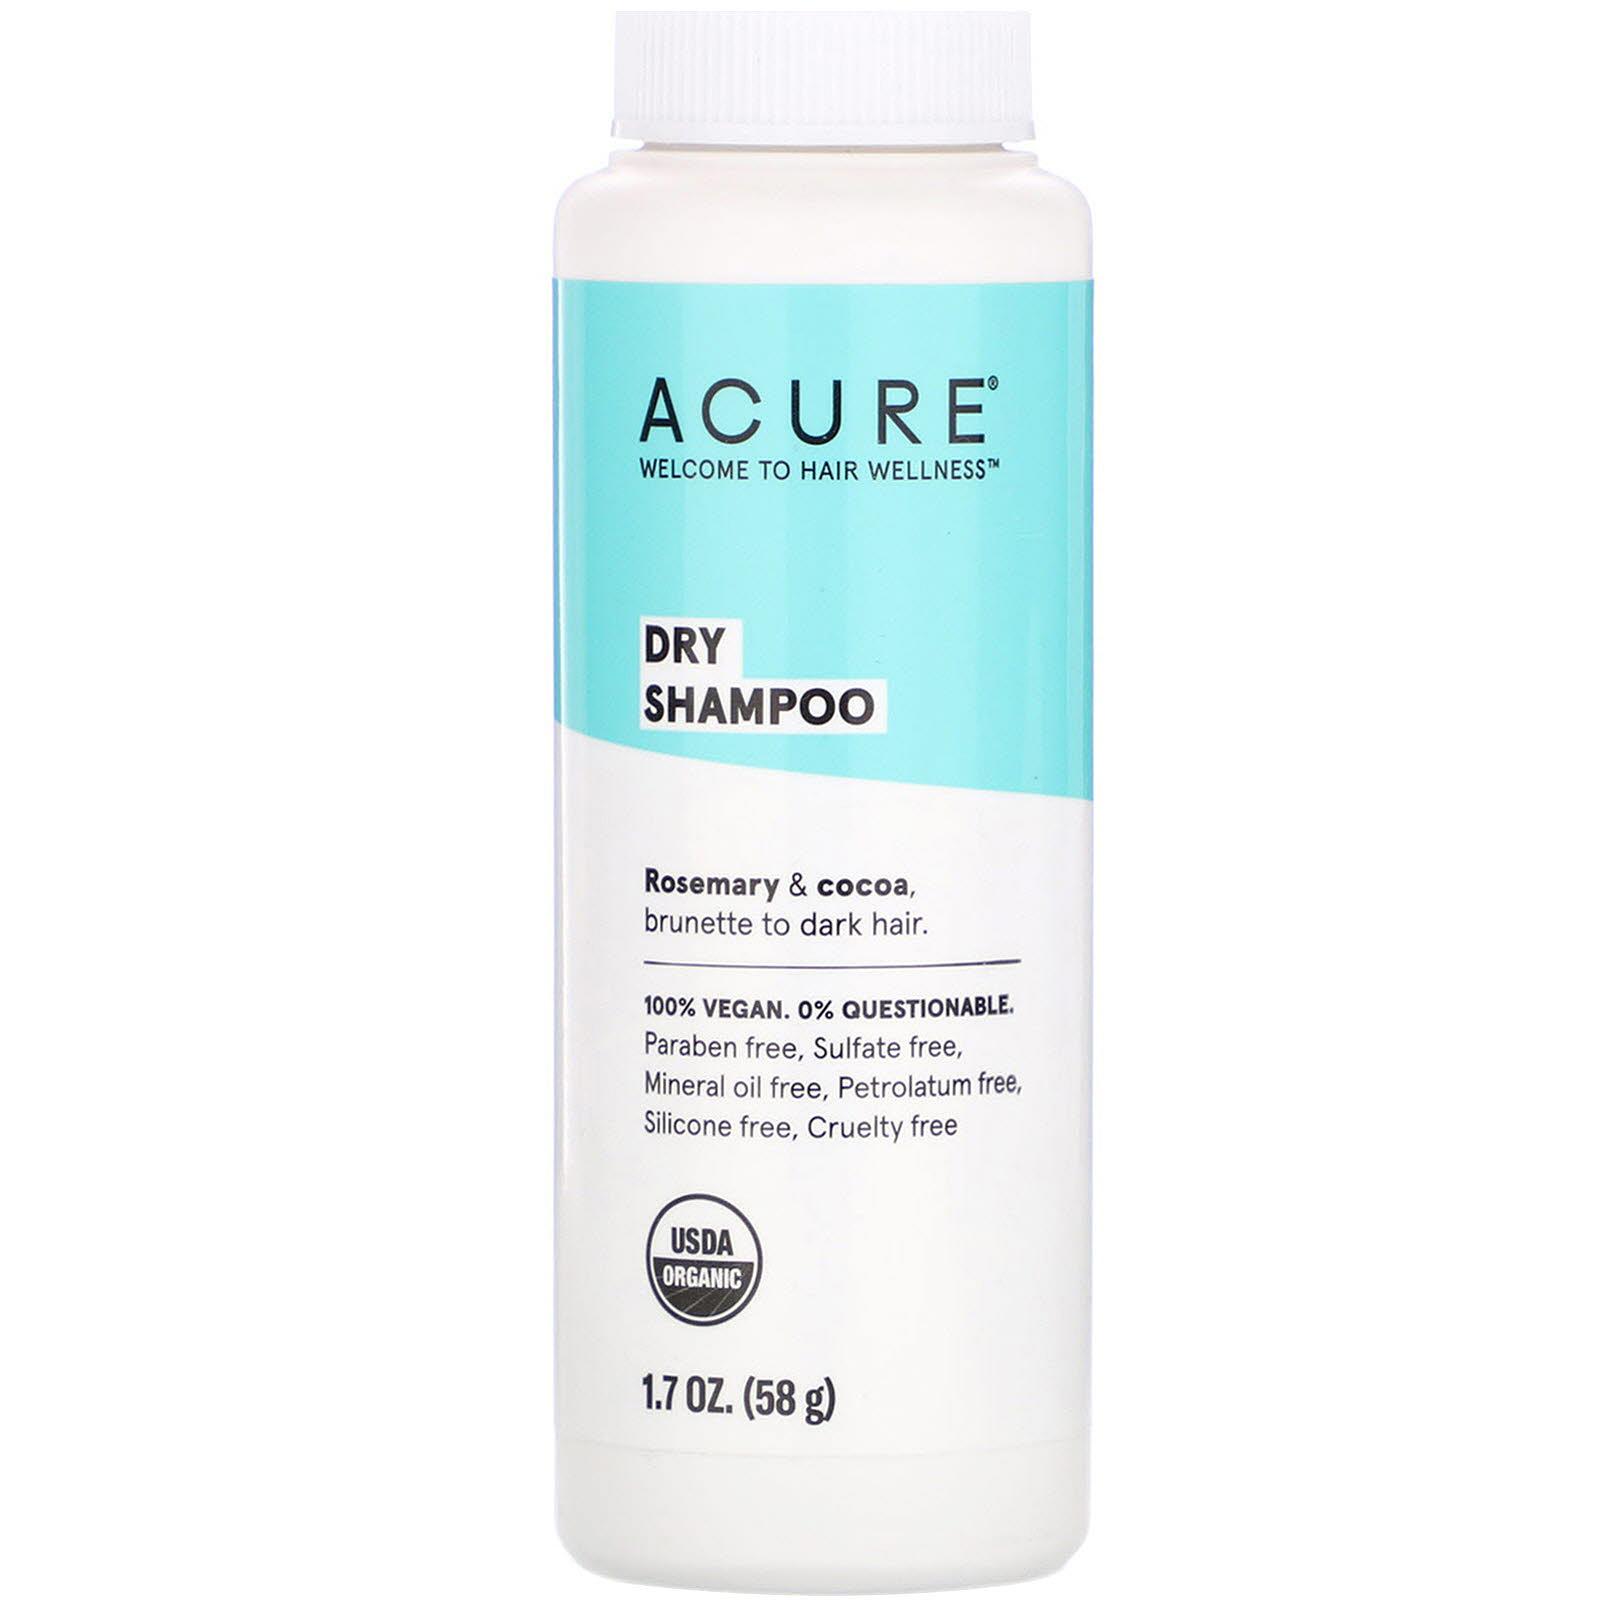 Acure Organics Dry Shampoo For Brunette To Dark Hair 1 7